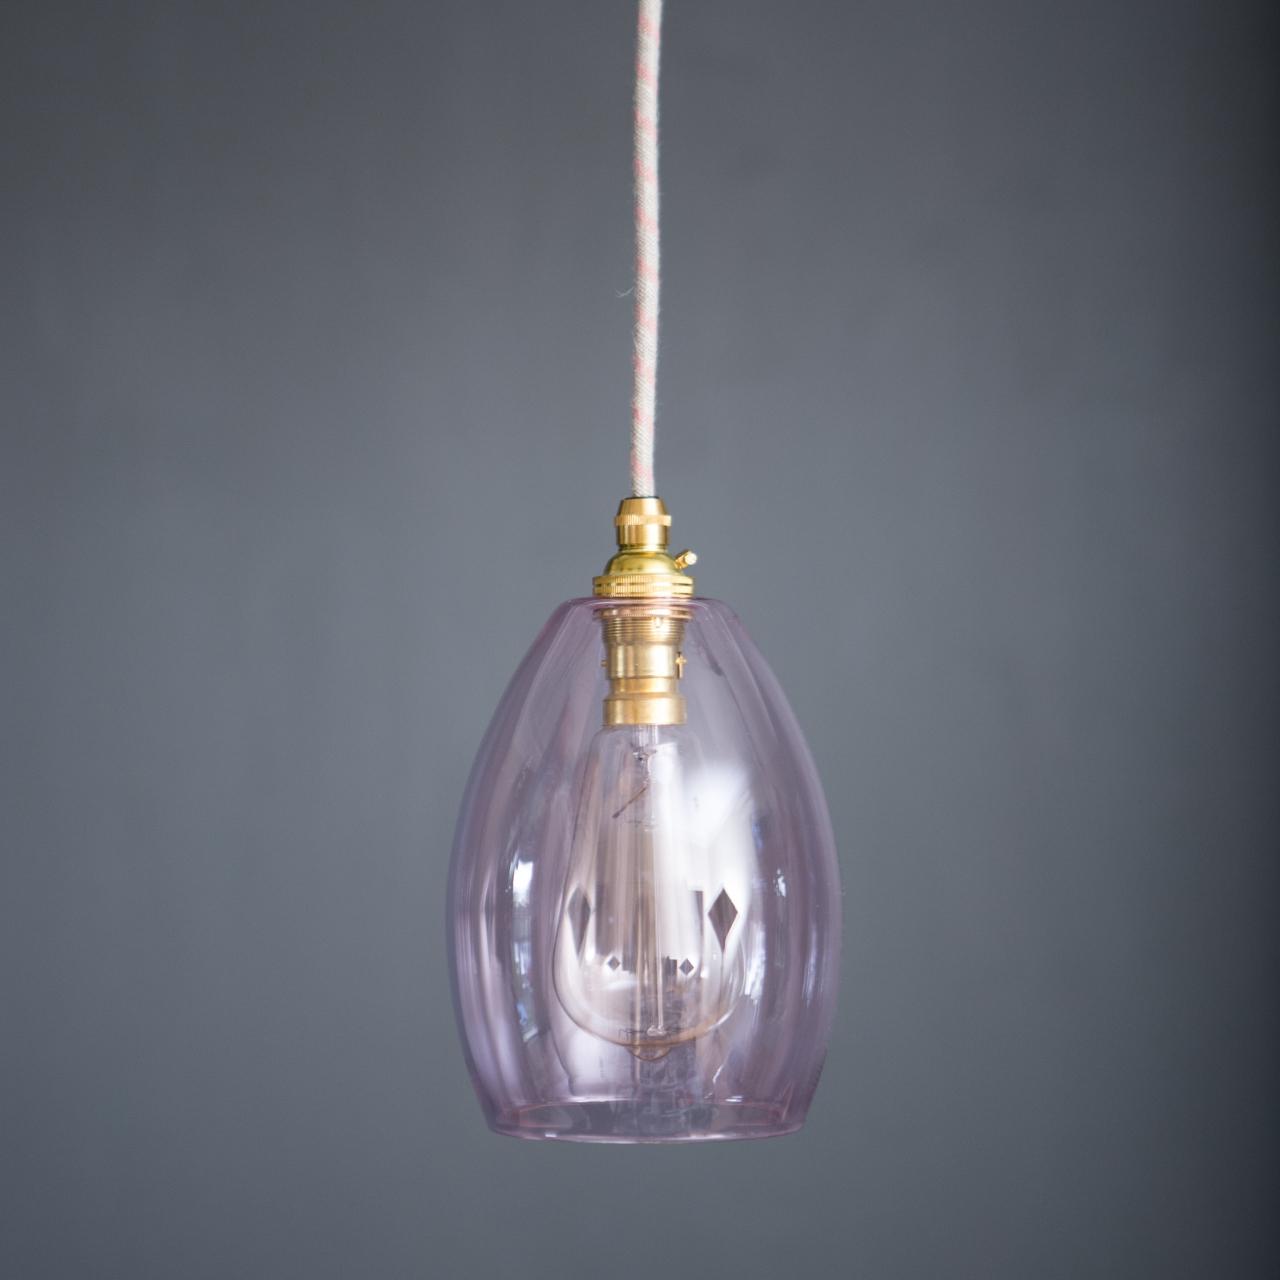 174eb40241f Pink glass pendant Light Bertie small - Glow Lighting